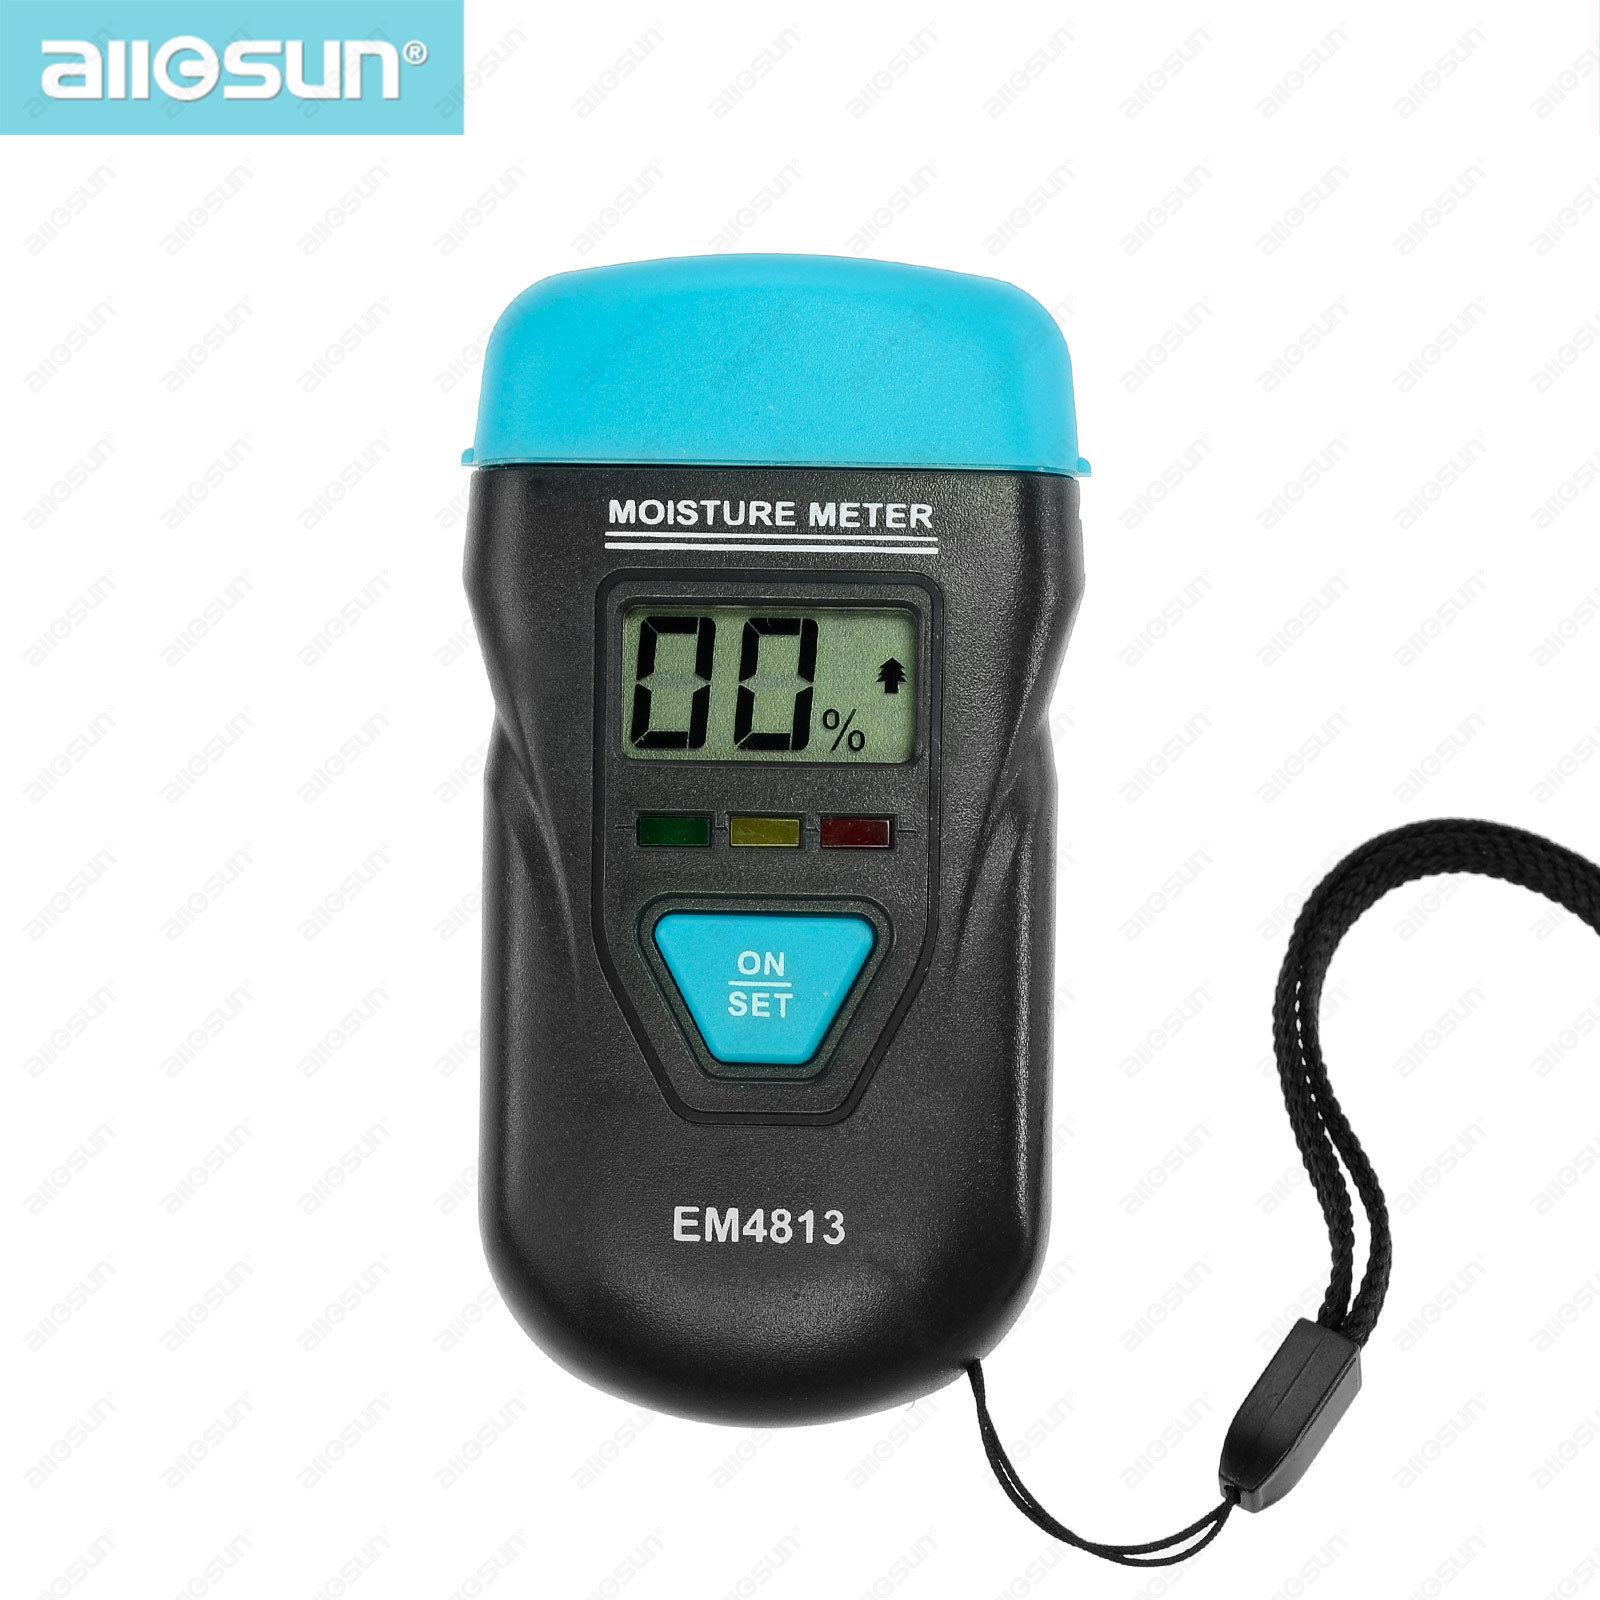 all-sun EM4813 Wood Building Material Moisture Meter Portable Environment temperature Tester Durable Moisture Meter